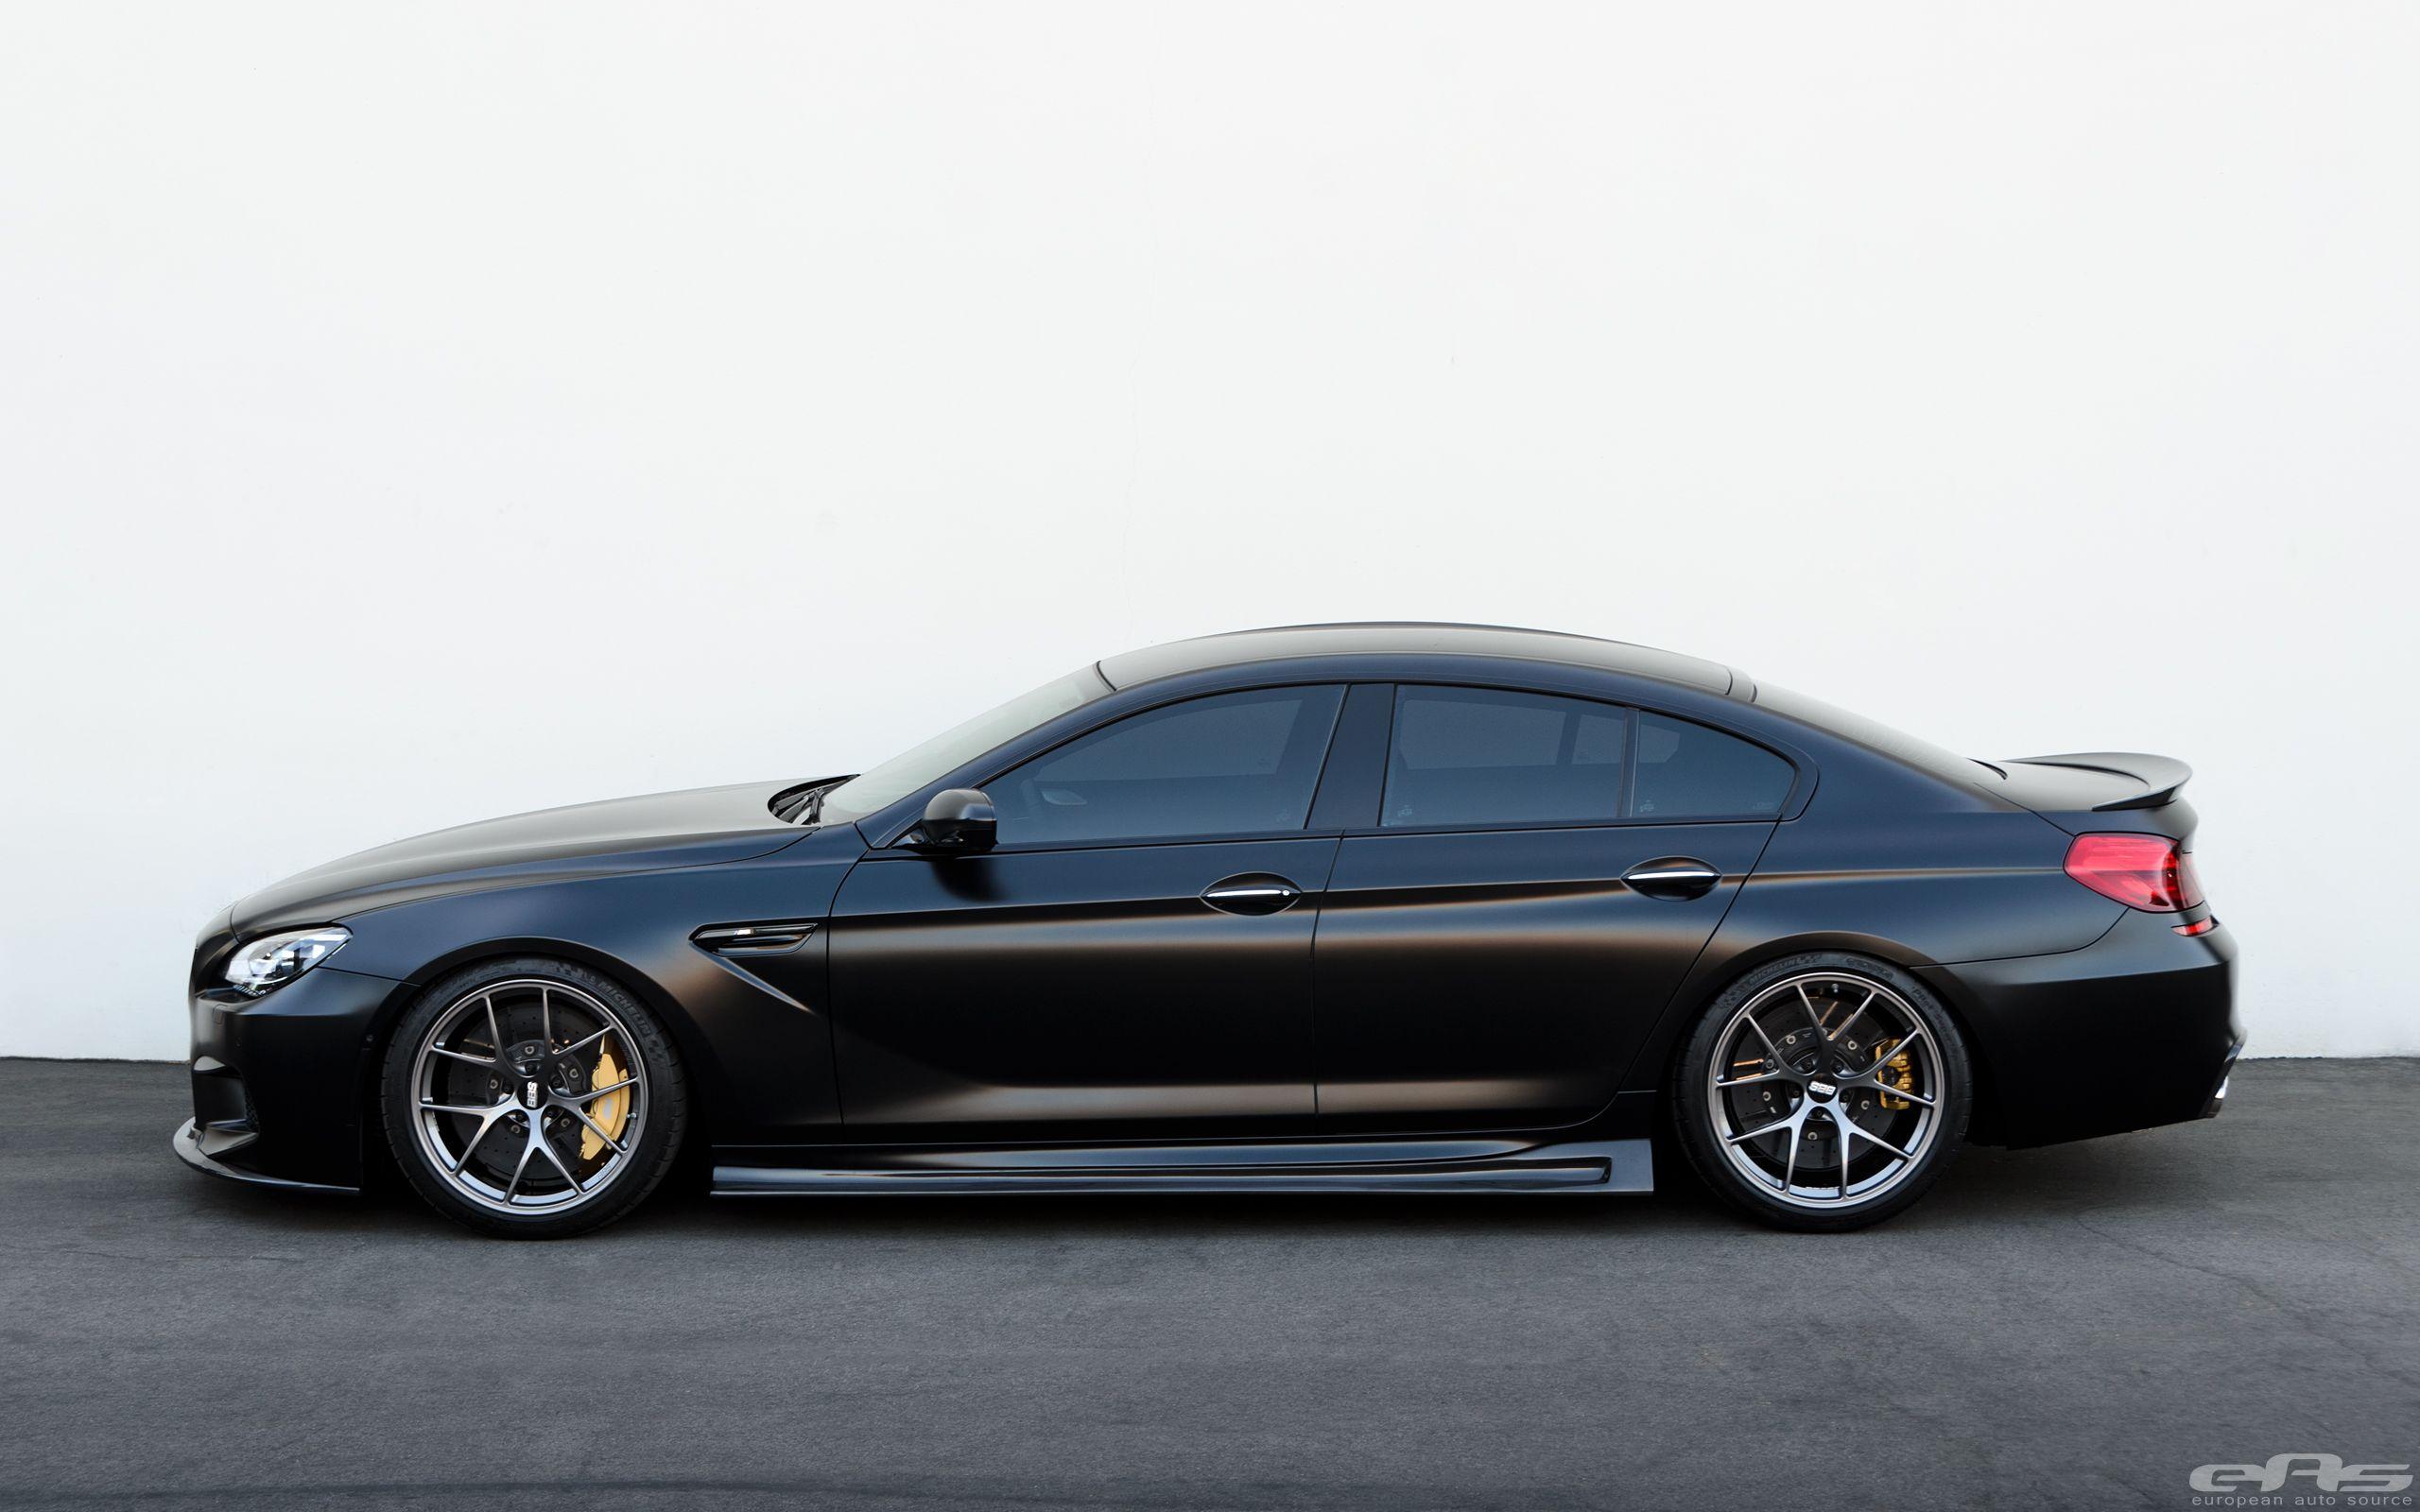 Frozen Black Bmw M6 Gran Coupe Is Breathtaking Bmw M6 Bmw